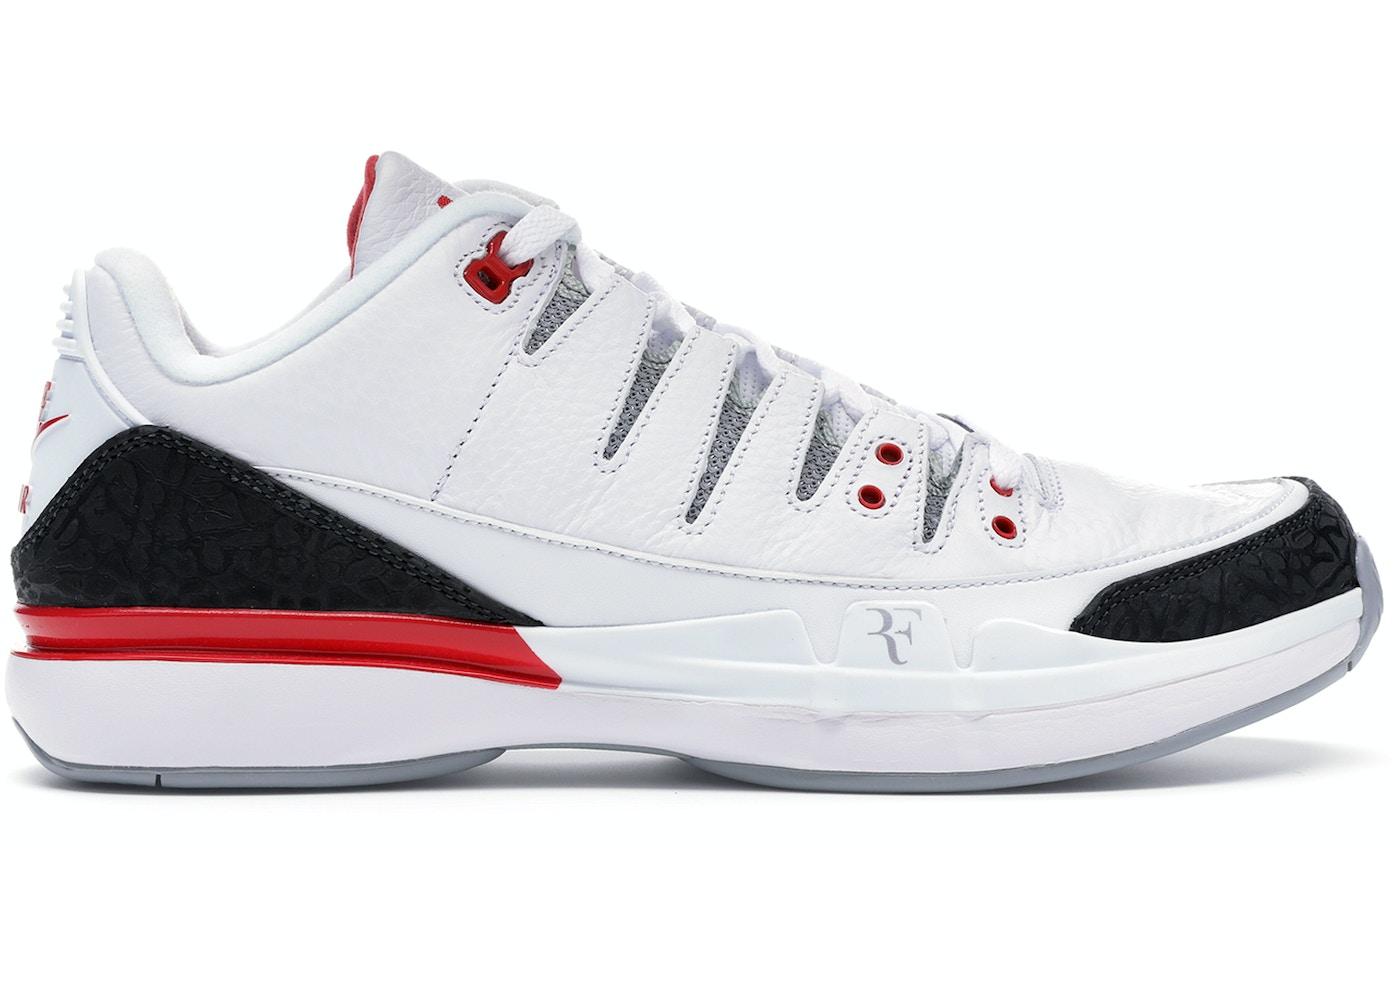 Nike Zoom Vapor AJ3 Fire Red - 709998-106 7618c66c4